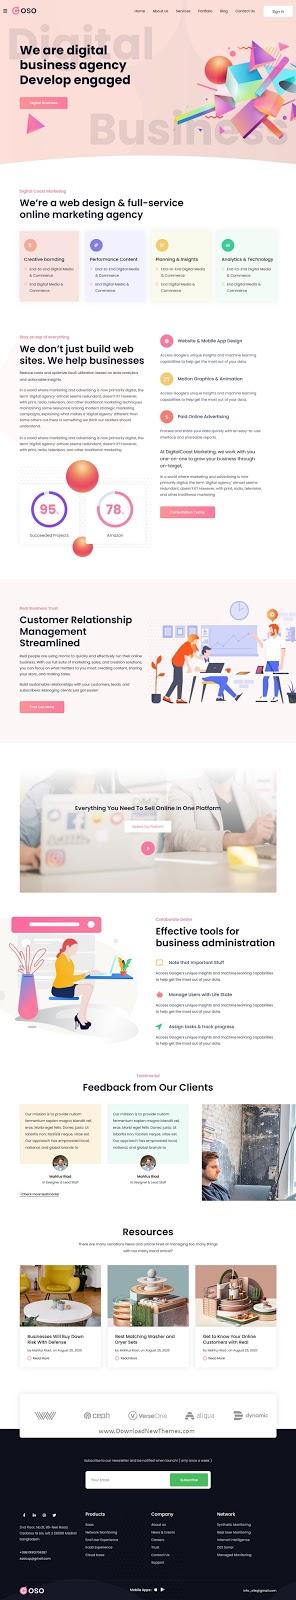 Best Creative Agency Website Template